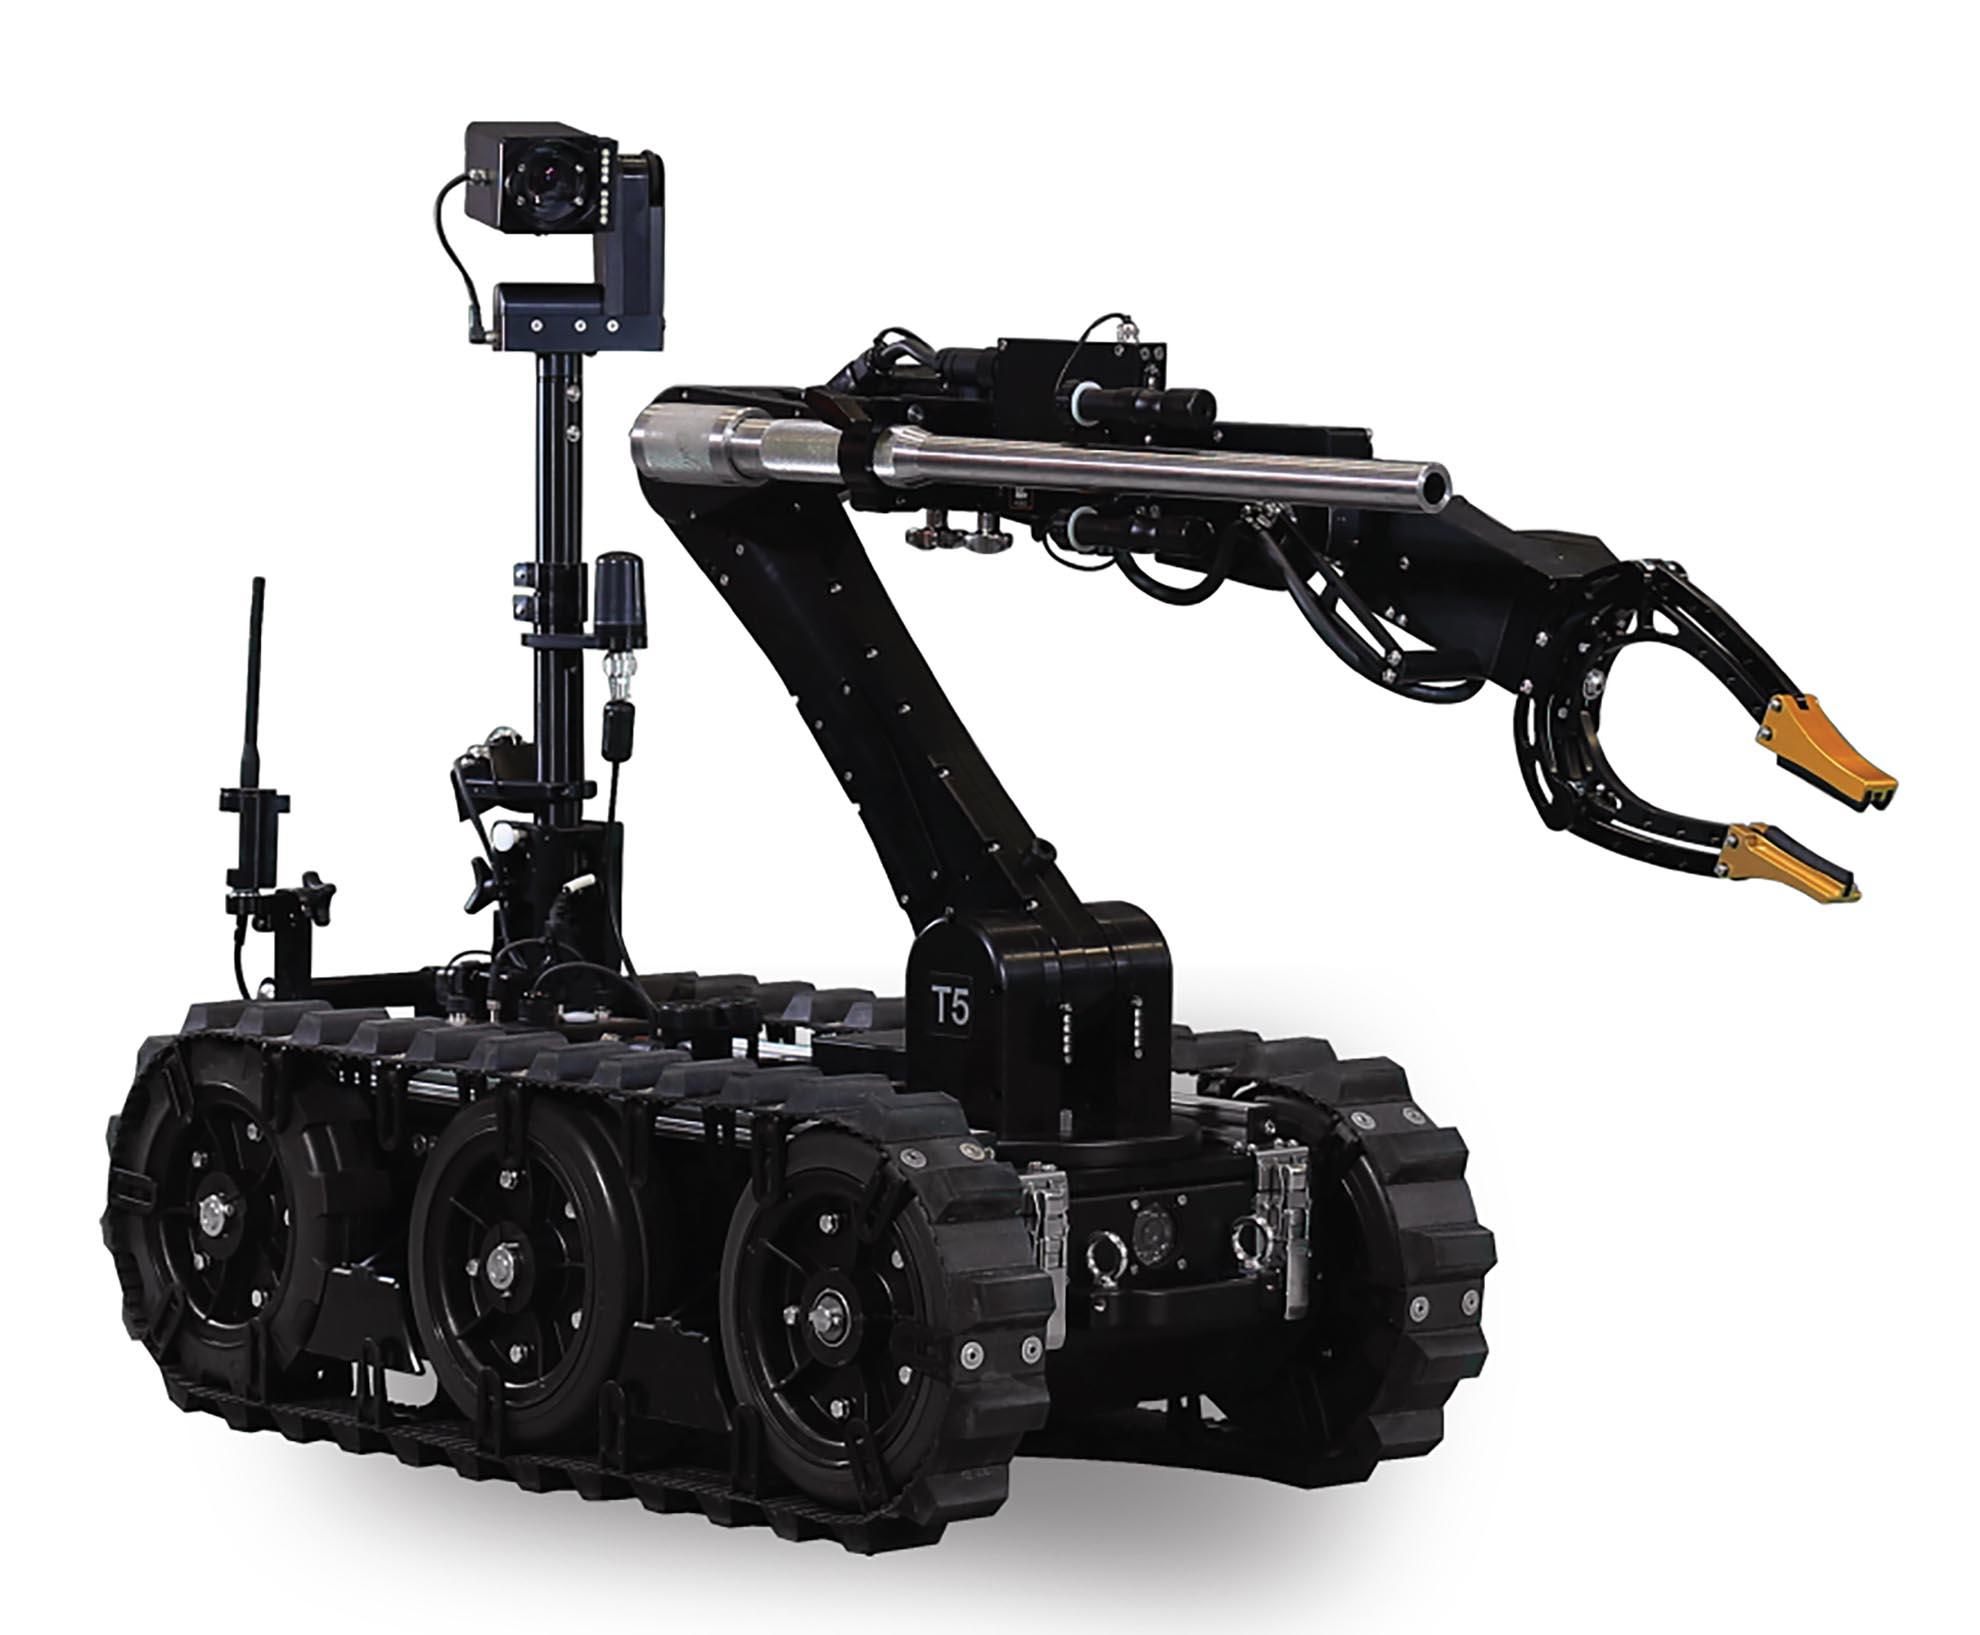 caliber-t5-swat-eod-robot